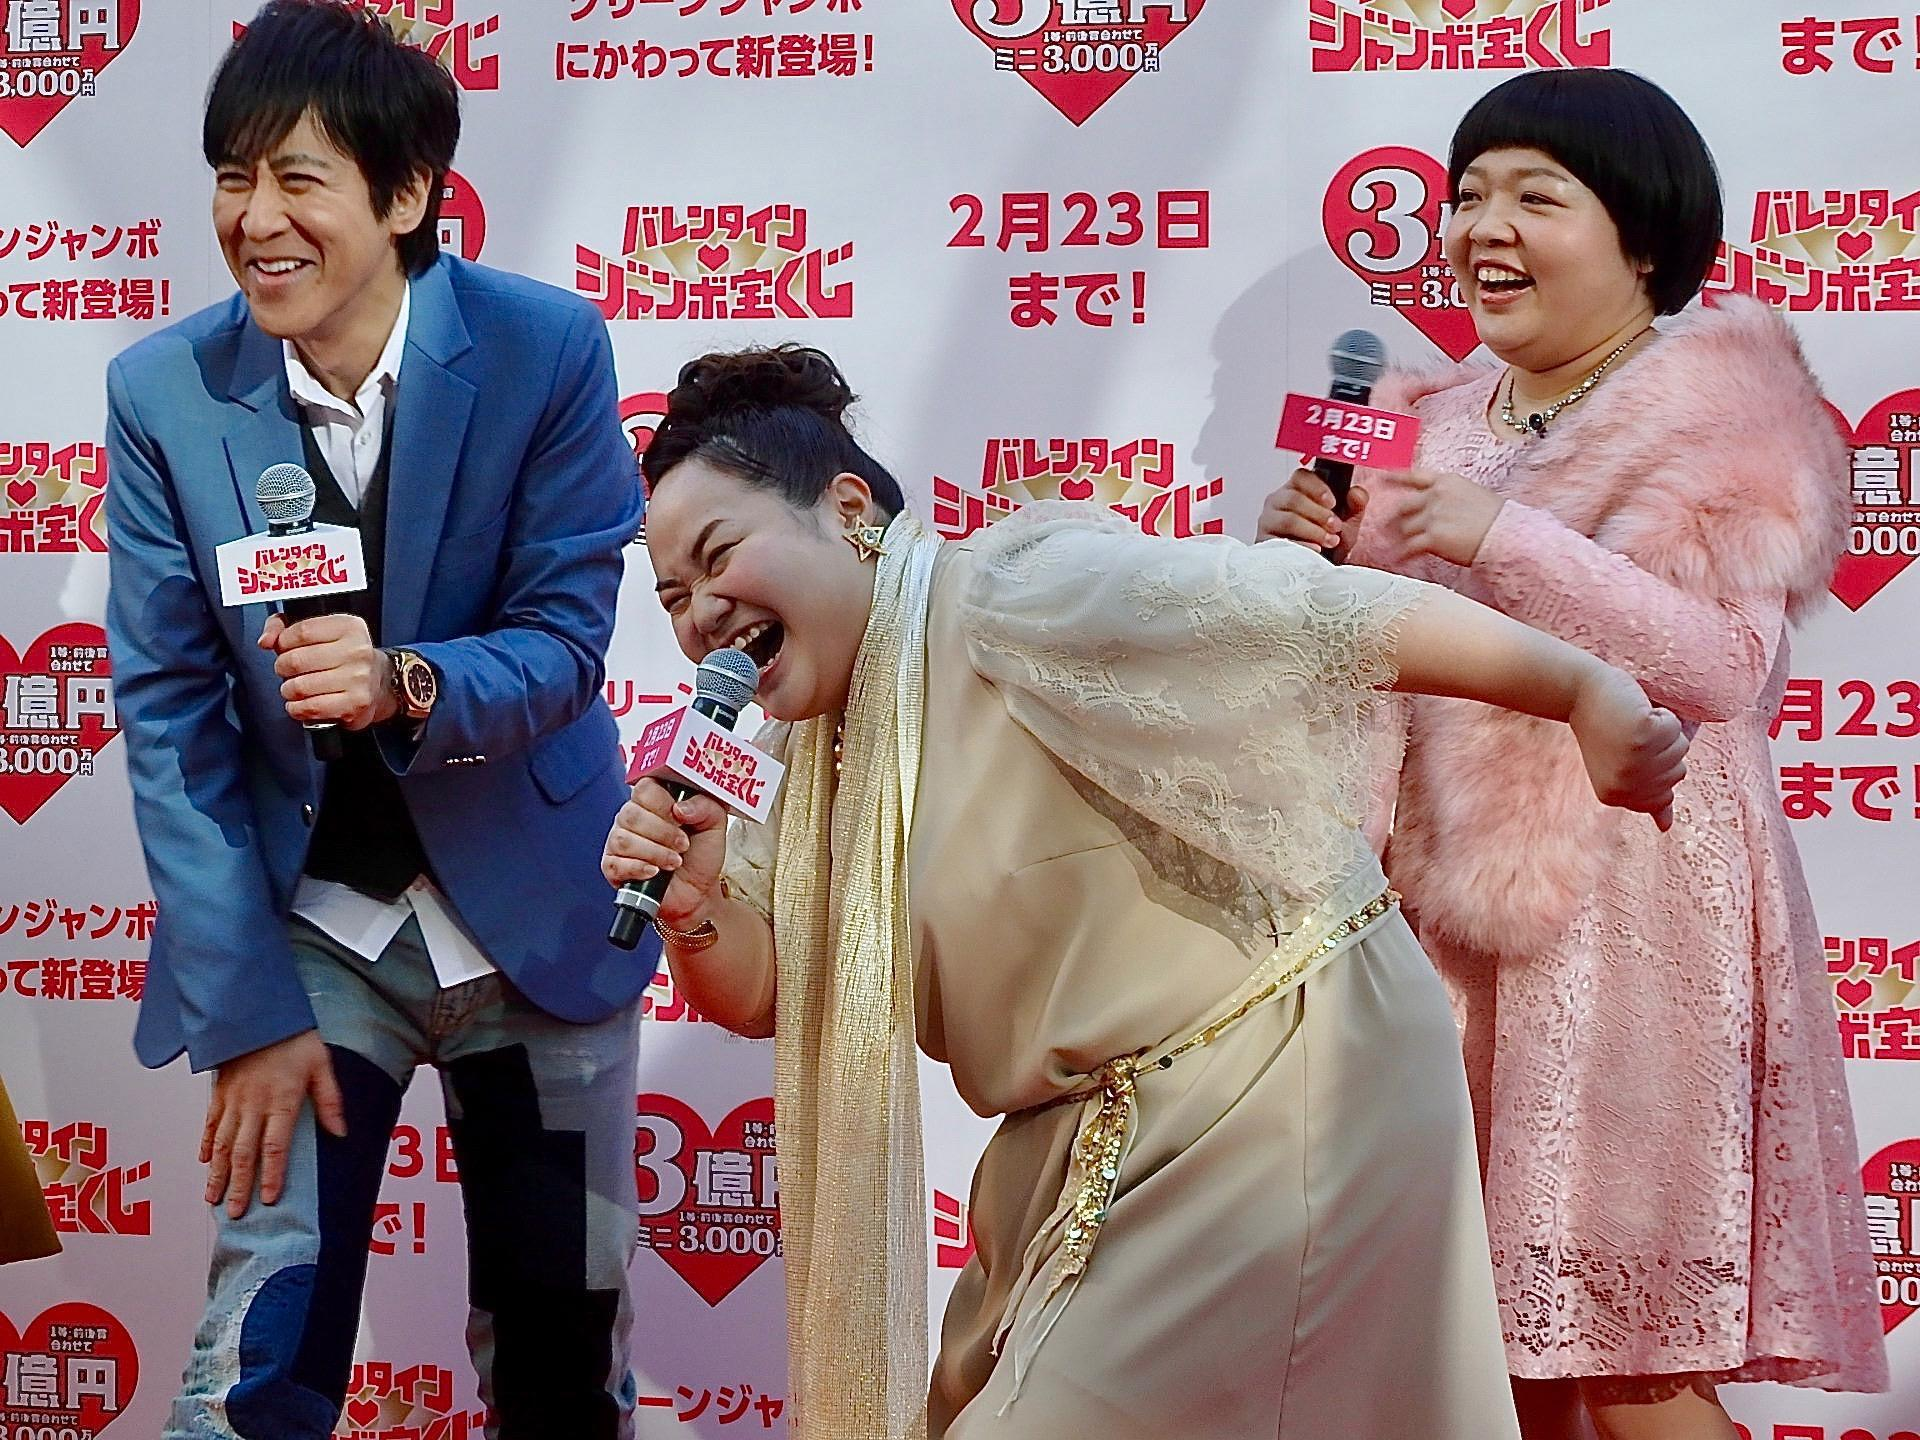 http://news.yoshimoto.co.jp/20180131180730-781330cb640f6fb19b1650e6339e99d29109d765.jpg